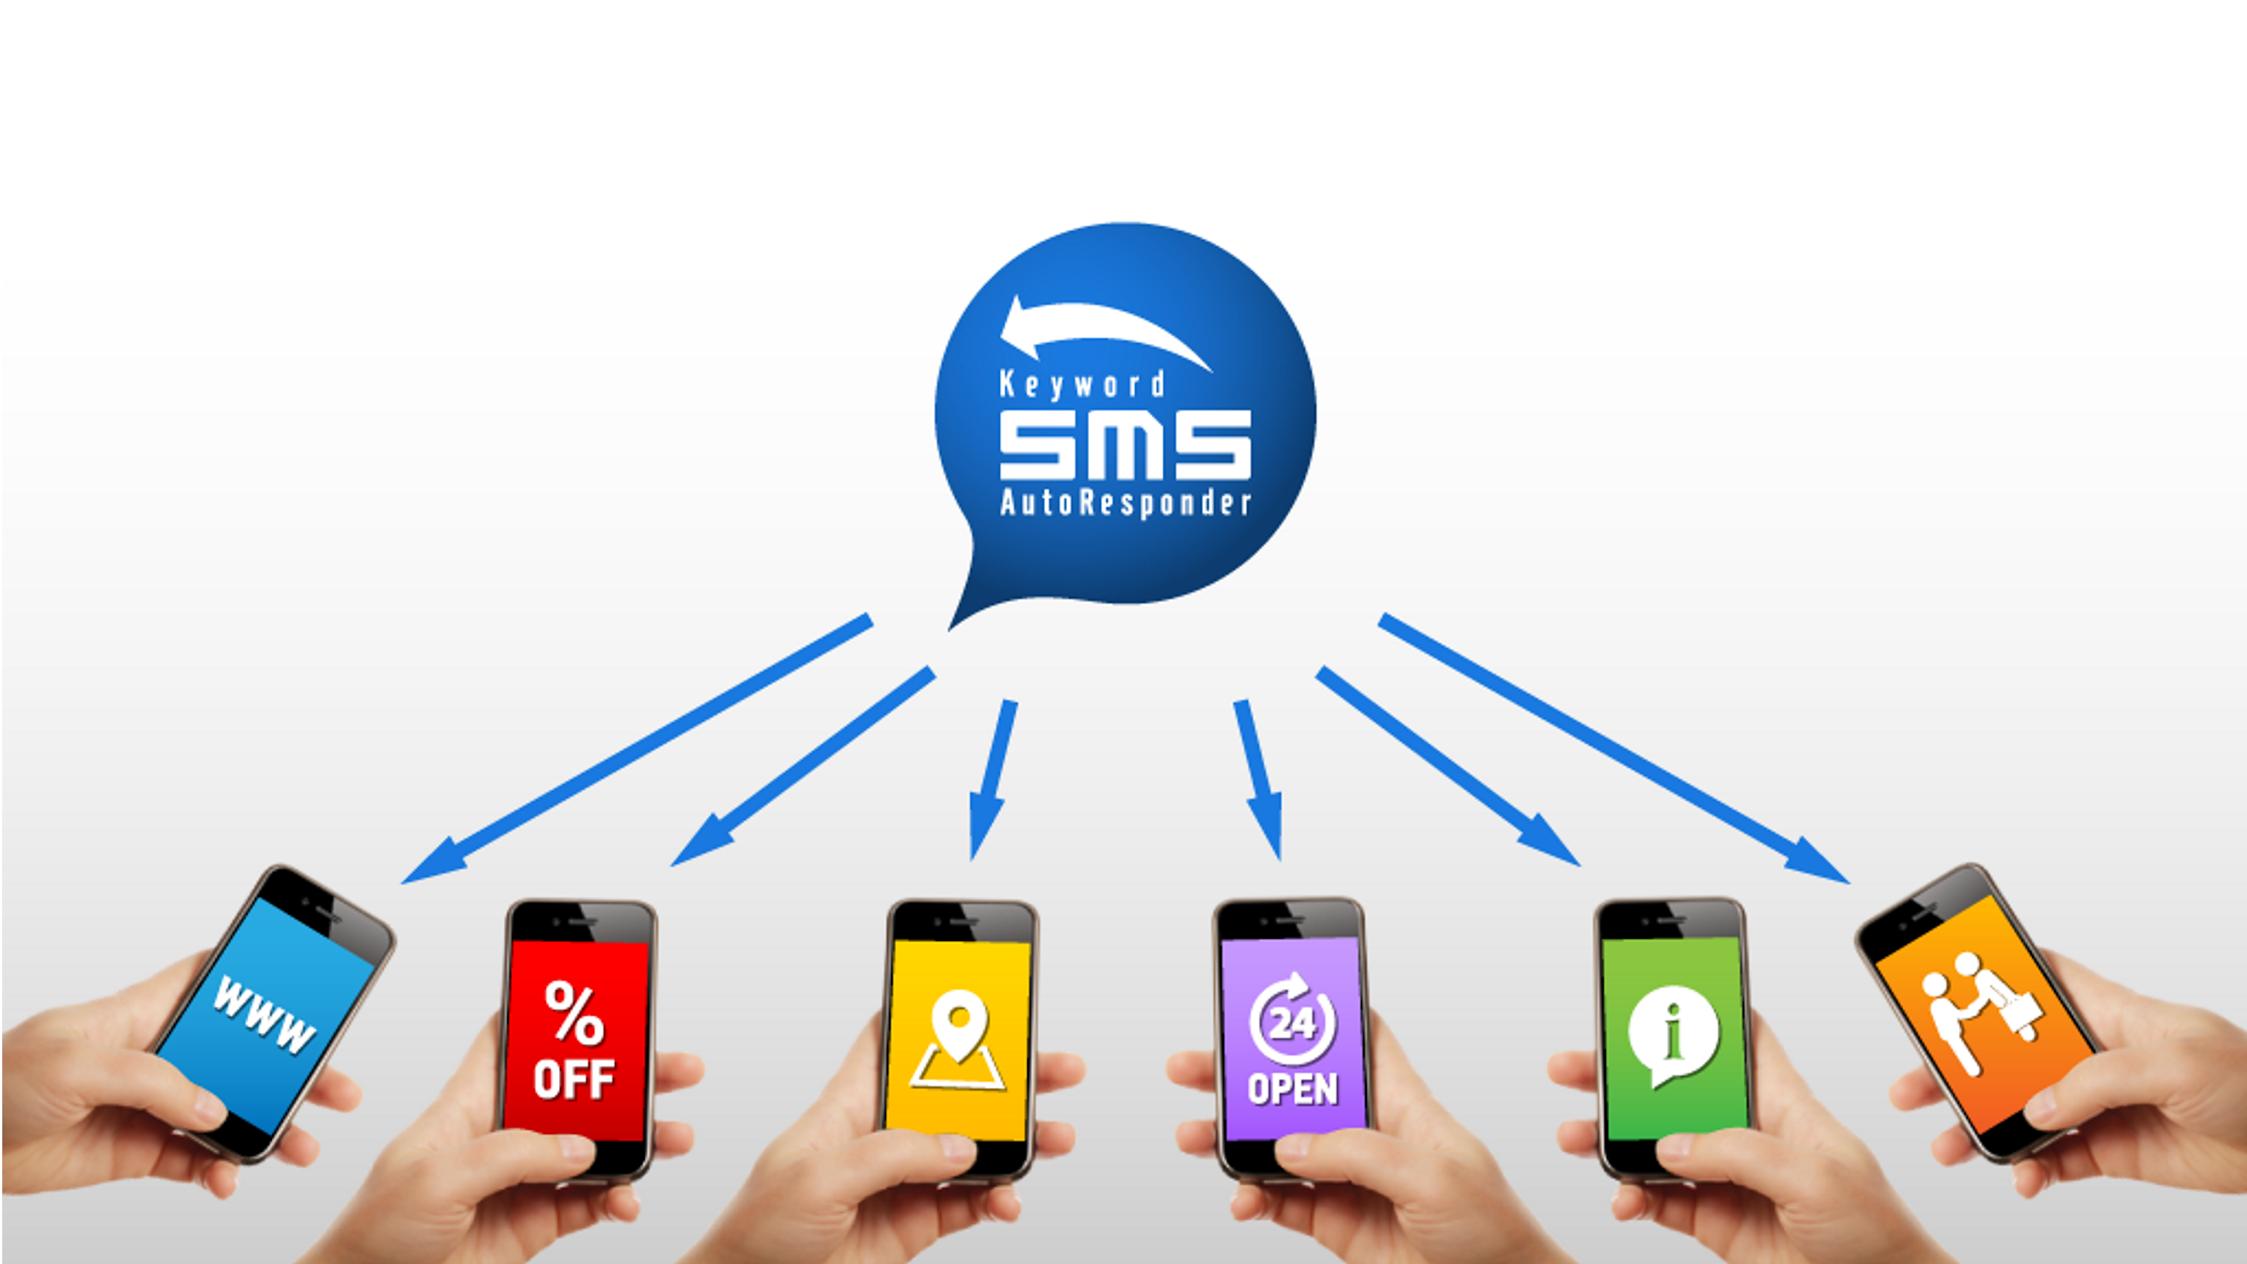 LeMi Apps / Business Marketing Apps